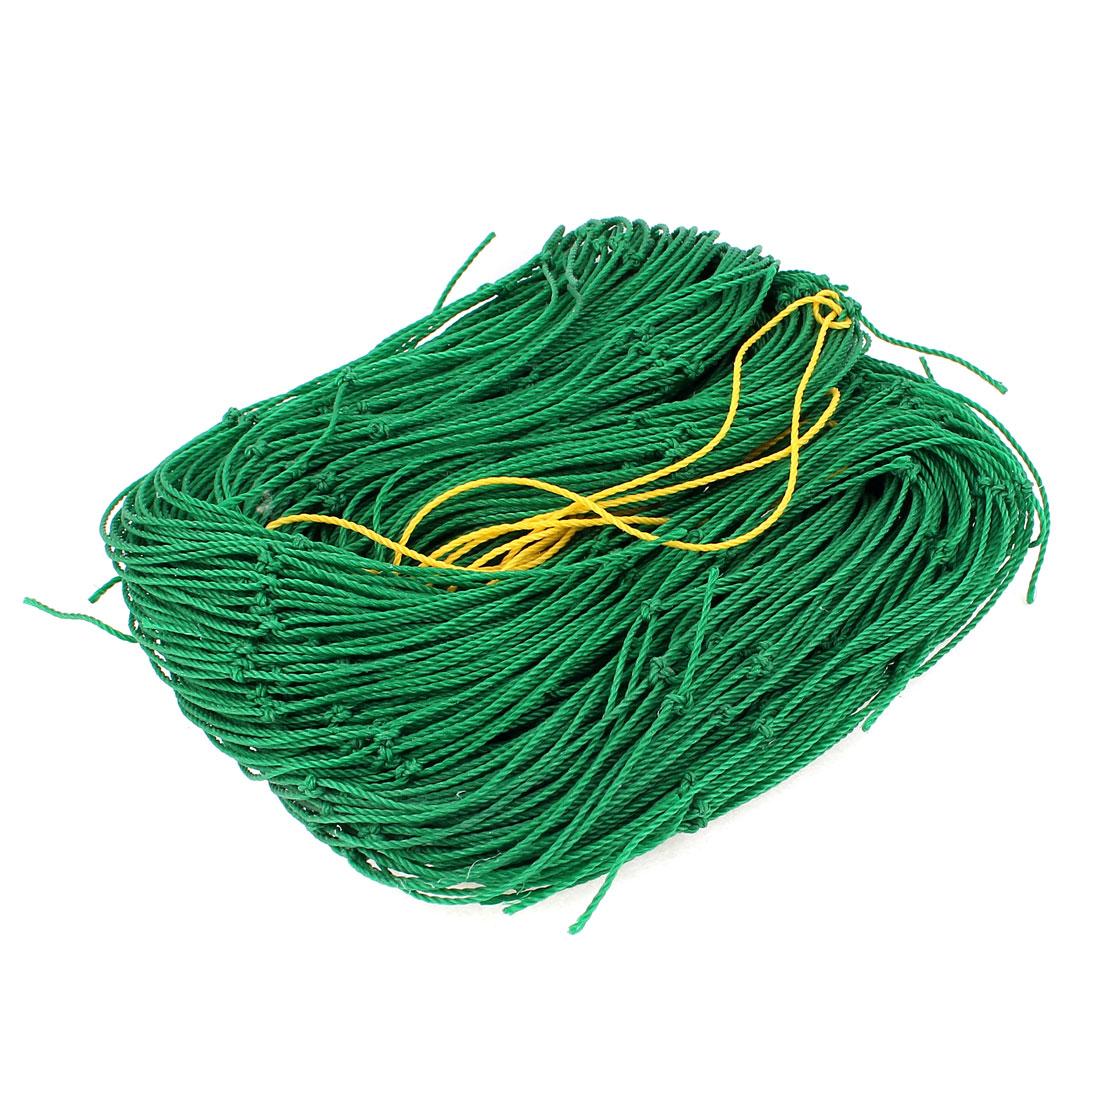 1.8m x 3.6m Green Nylon Hanging Gardening Climbing Plant Support Nets